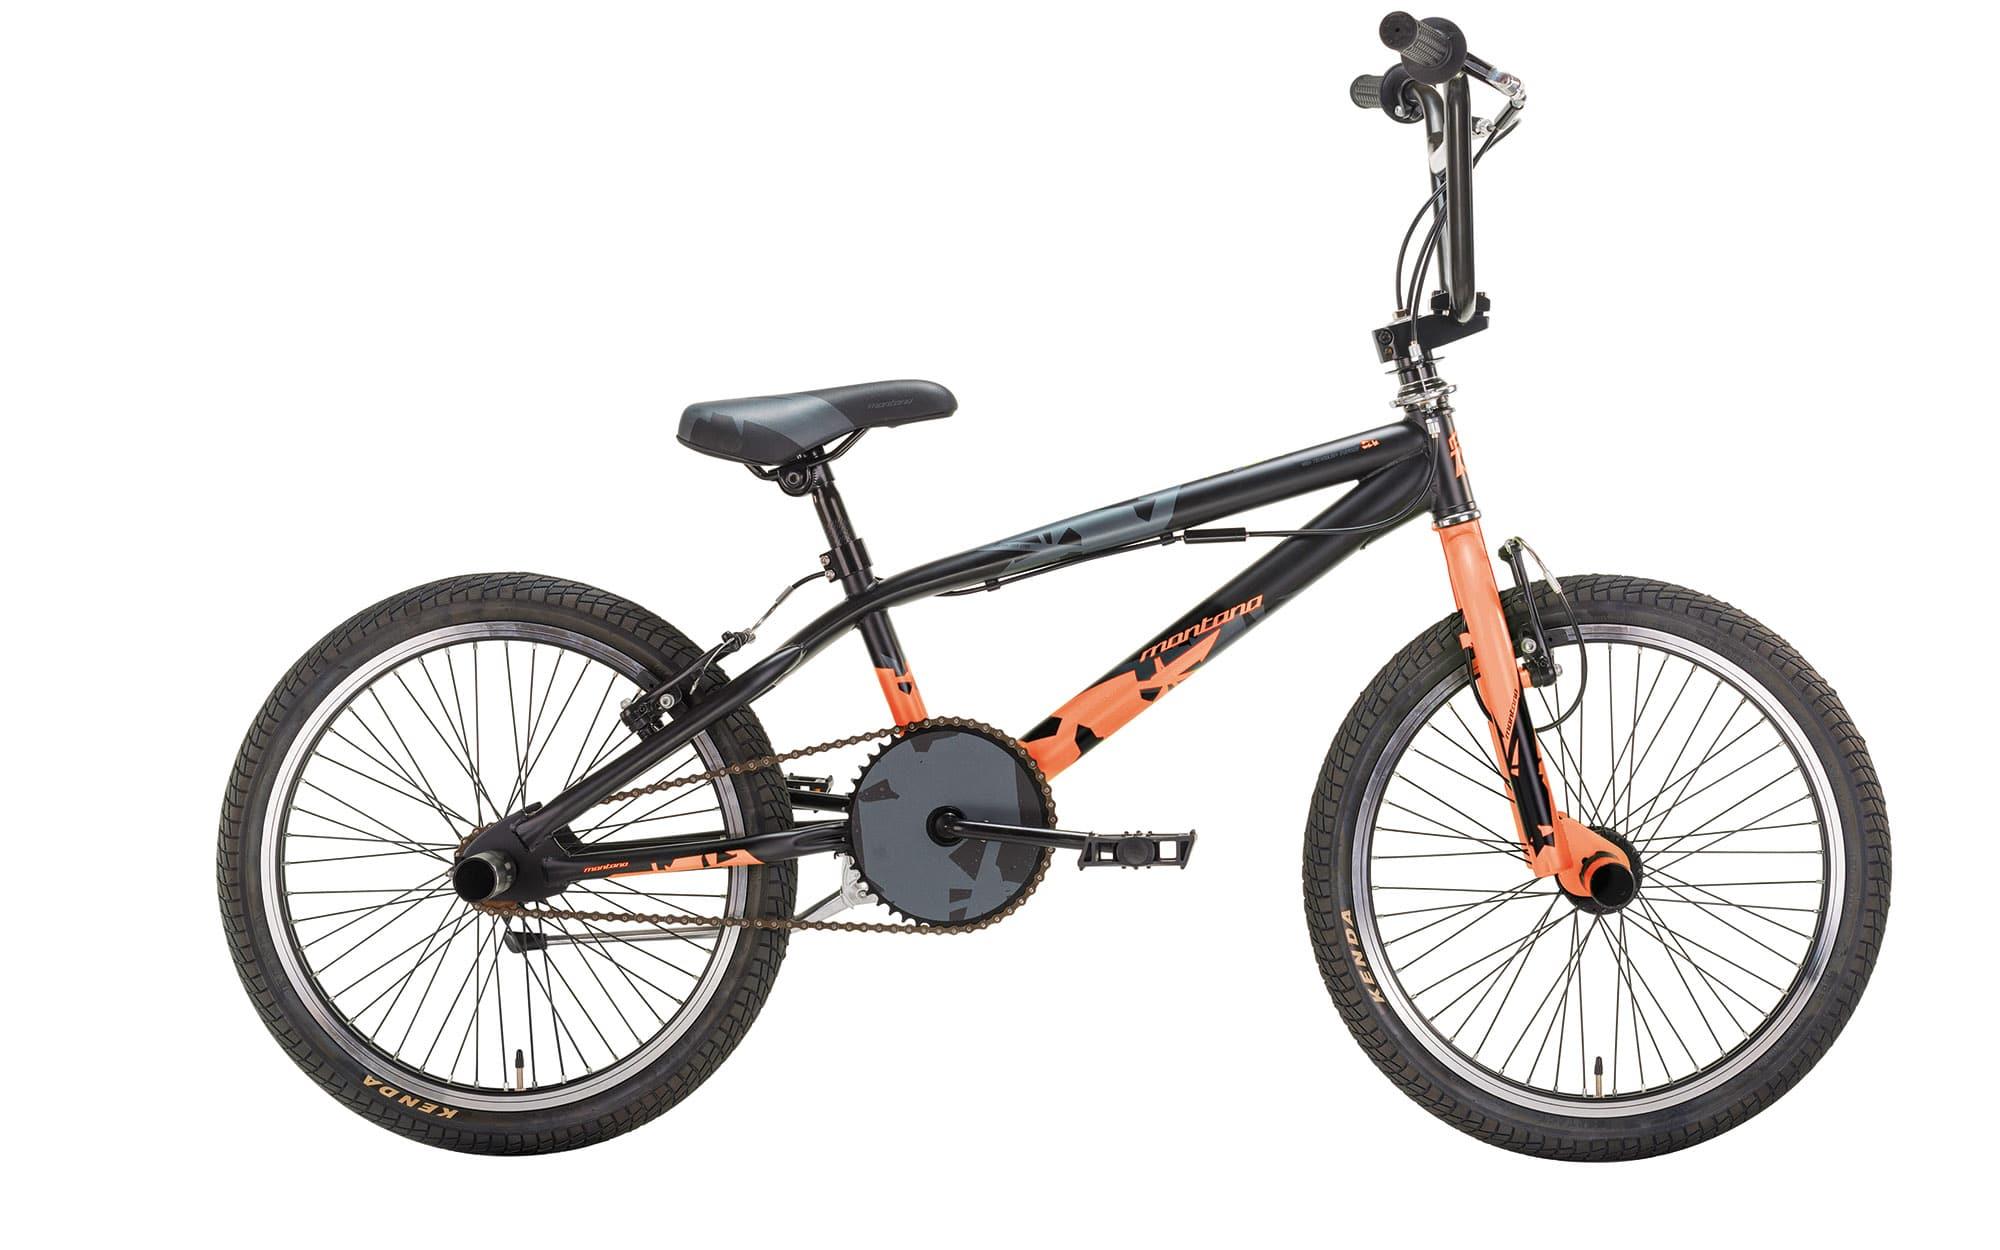 Montana Bmx wax 20 Sort/Orange | BMX-cykler